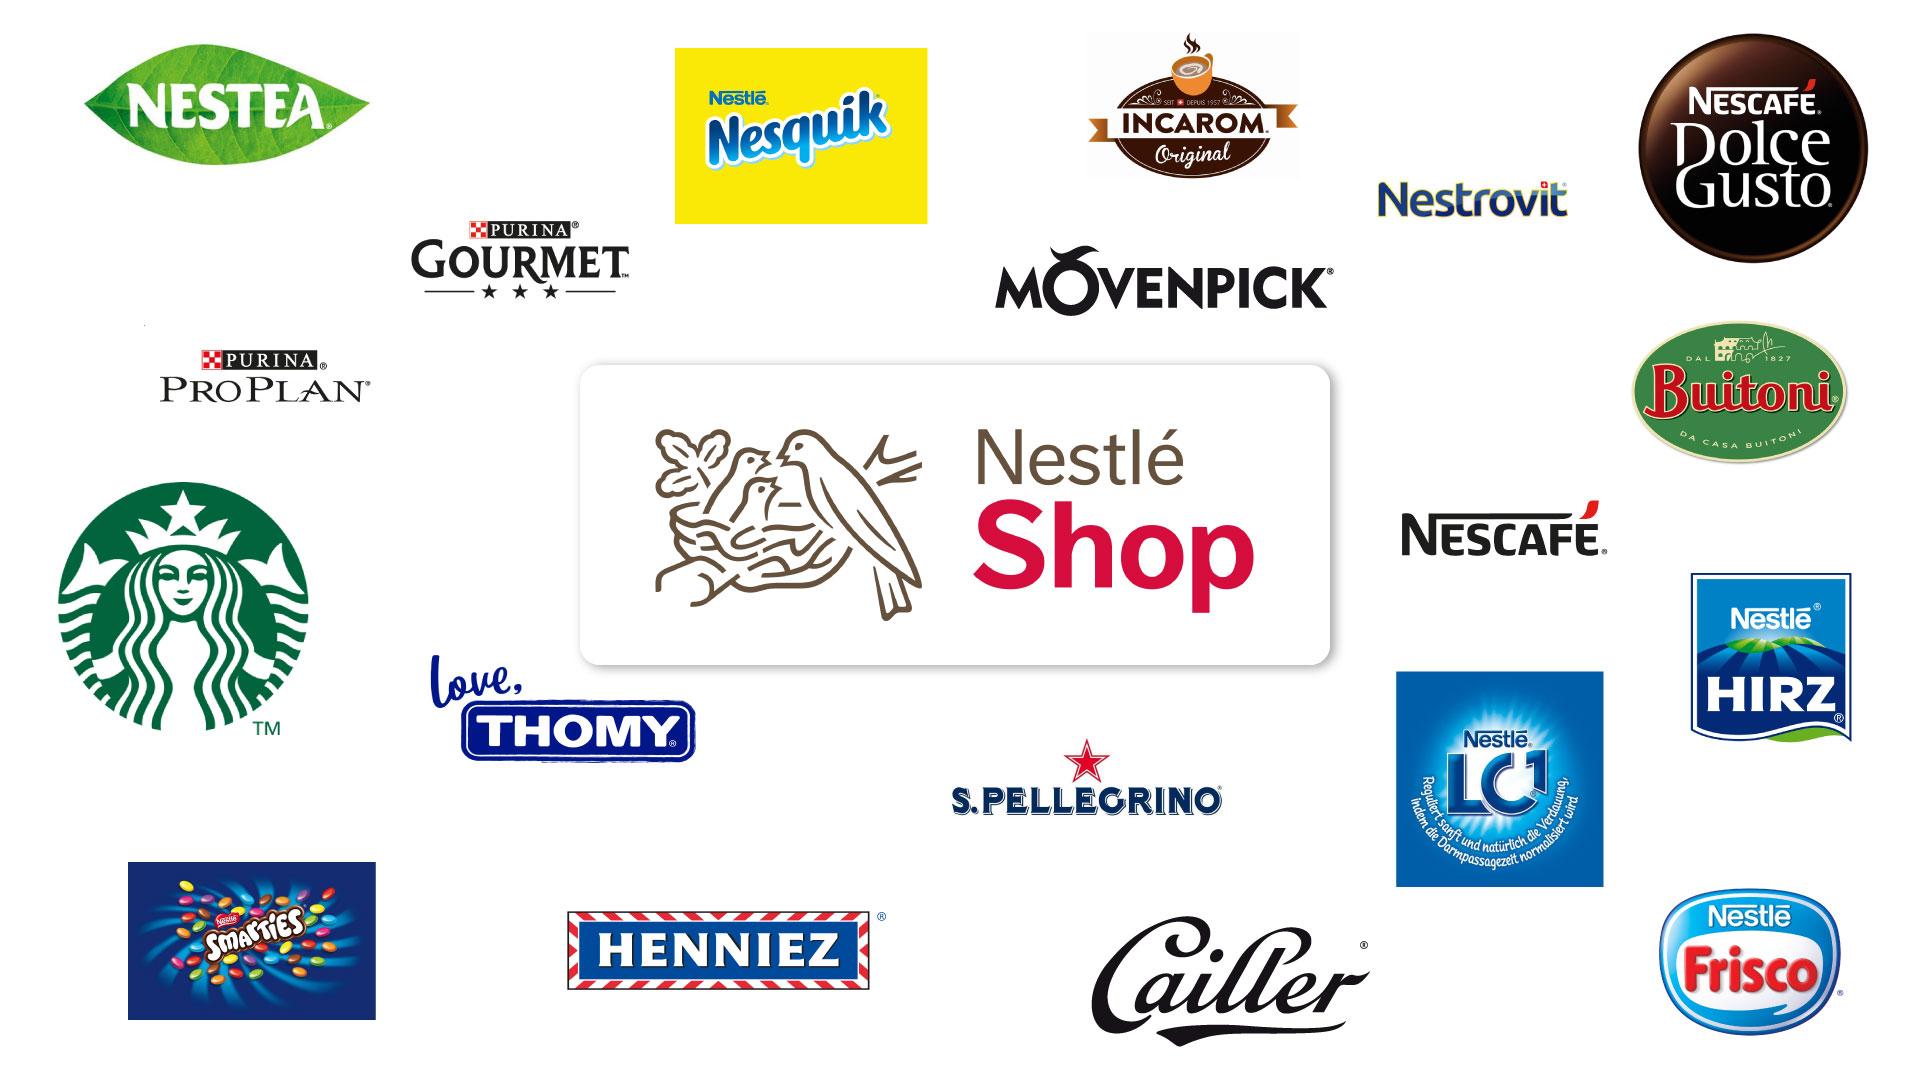 Nestlé Shop - Membership Privilege